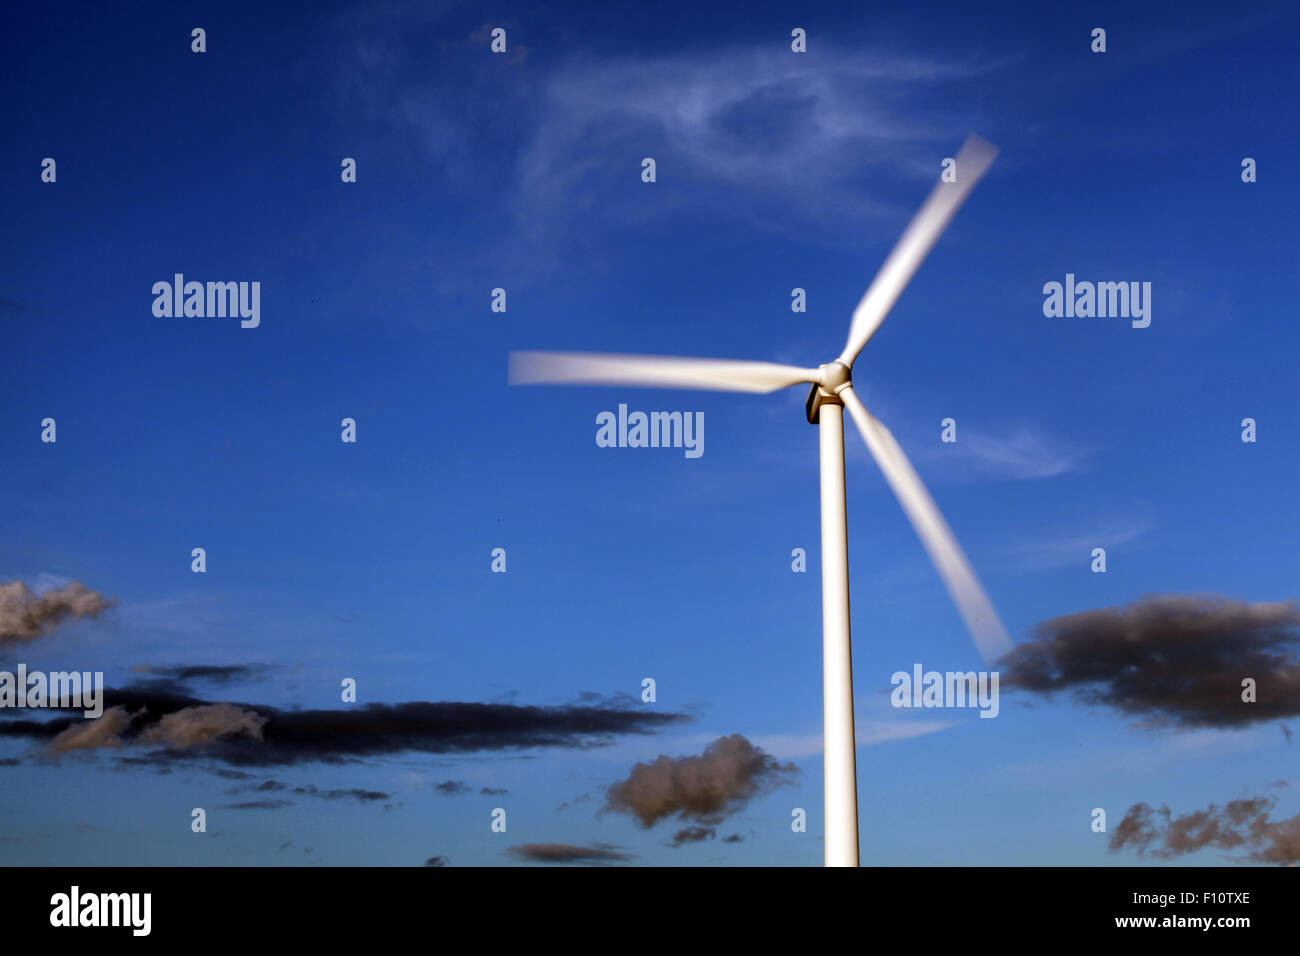 Windturbine gegen malerischen Himmel drehen. Dänemark. Stockbild